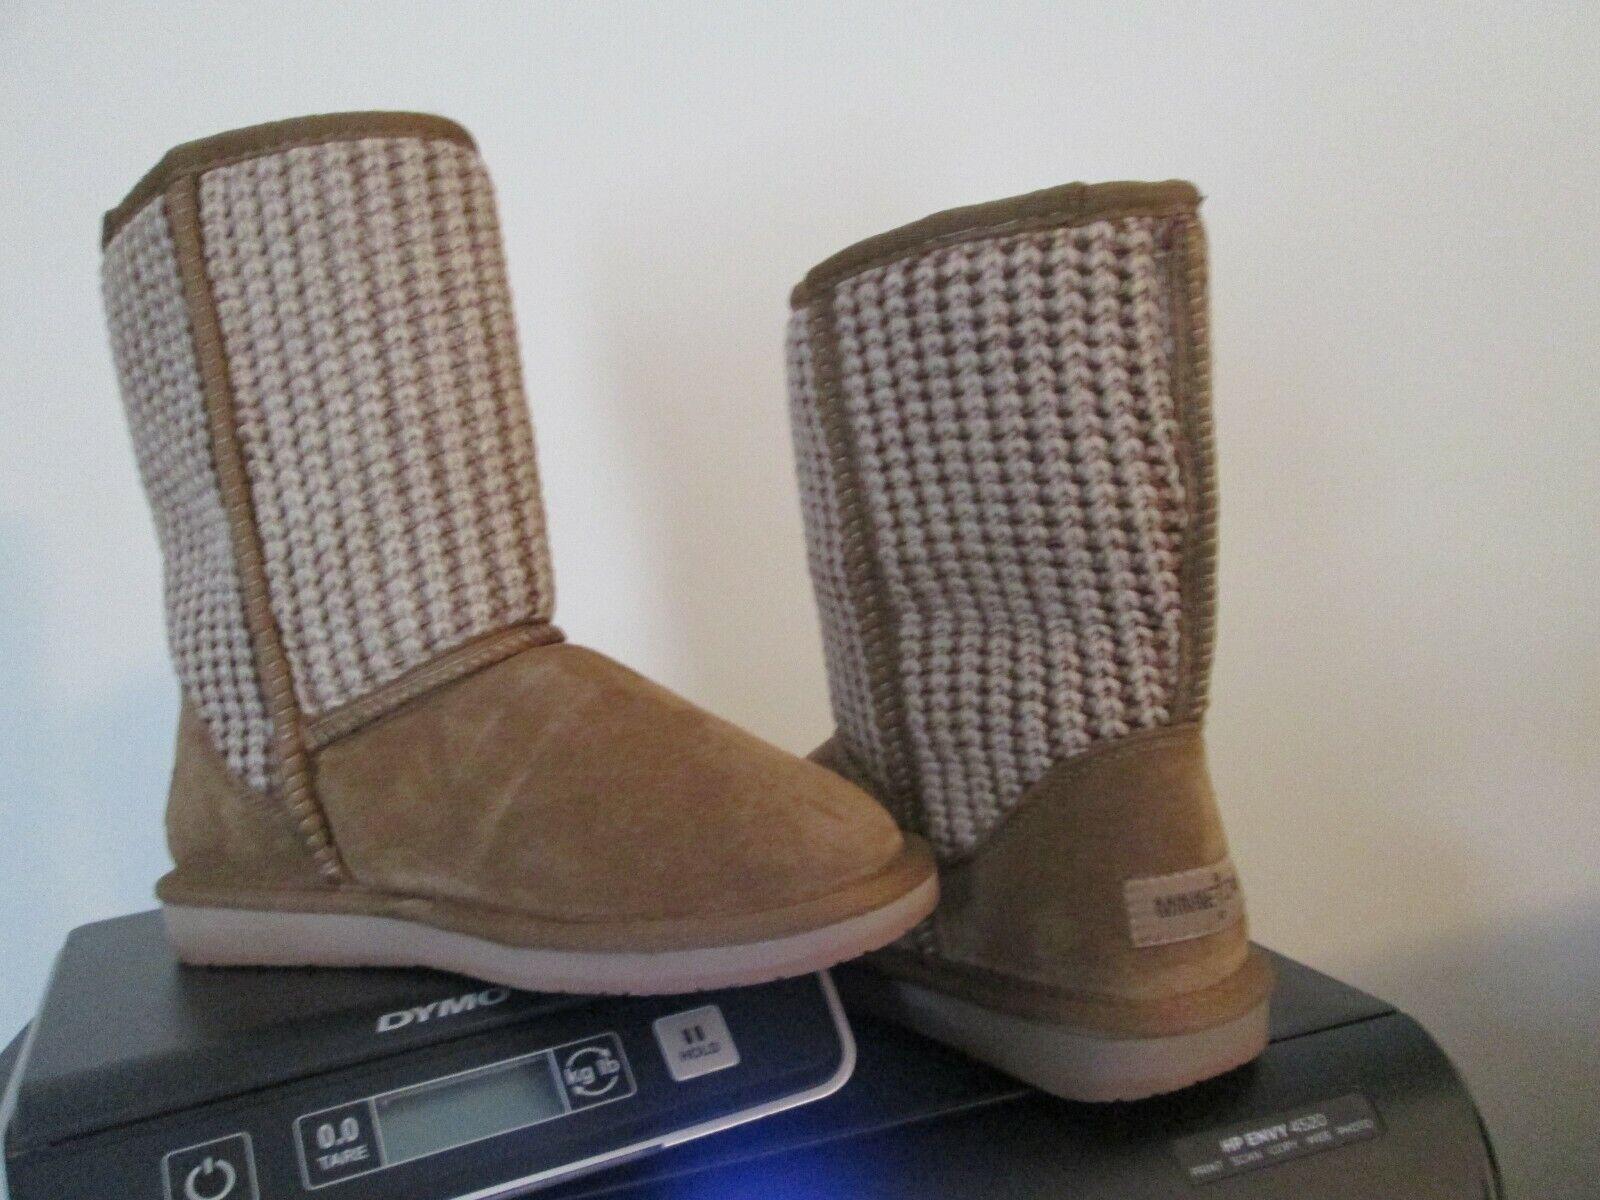 Minnetonka Tan Suede Leather Mid Calf Boots Women's Size 6 nwob sheepskin lined